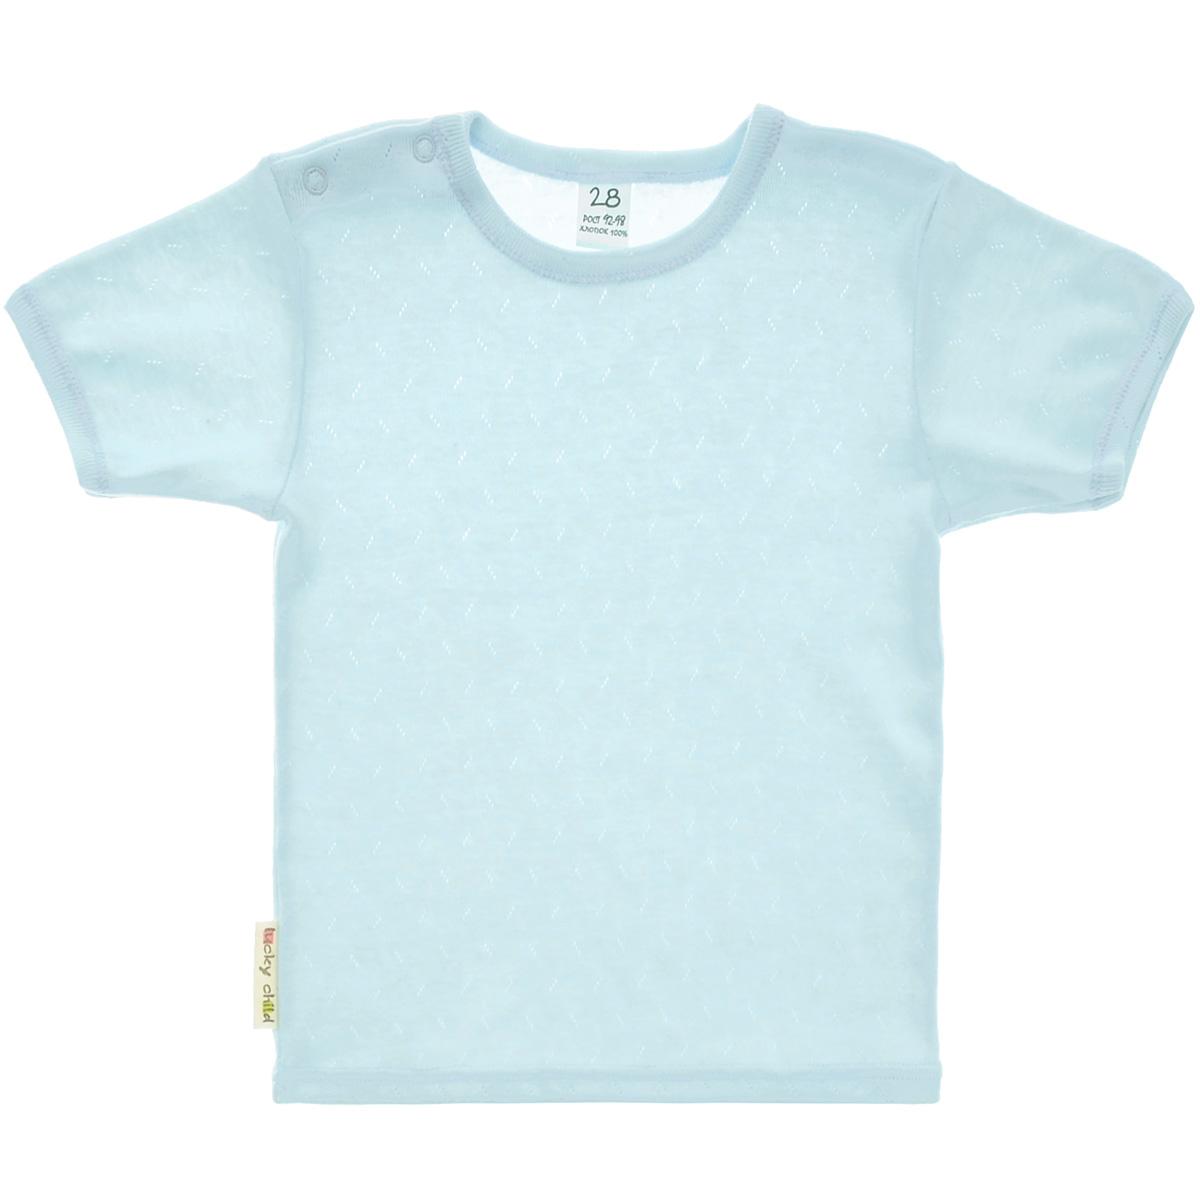 Футболка детская Lucky Child Ажур, цвет: голубой. 0-26. Размер 98/104